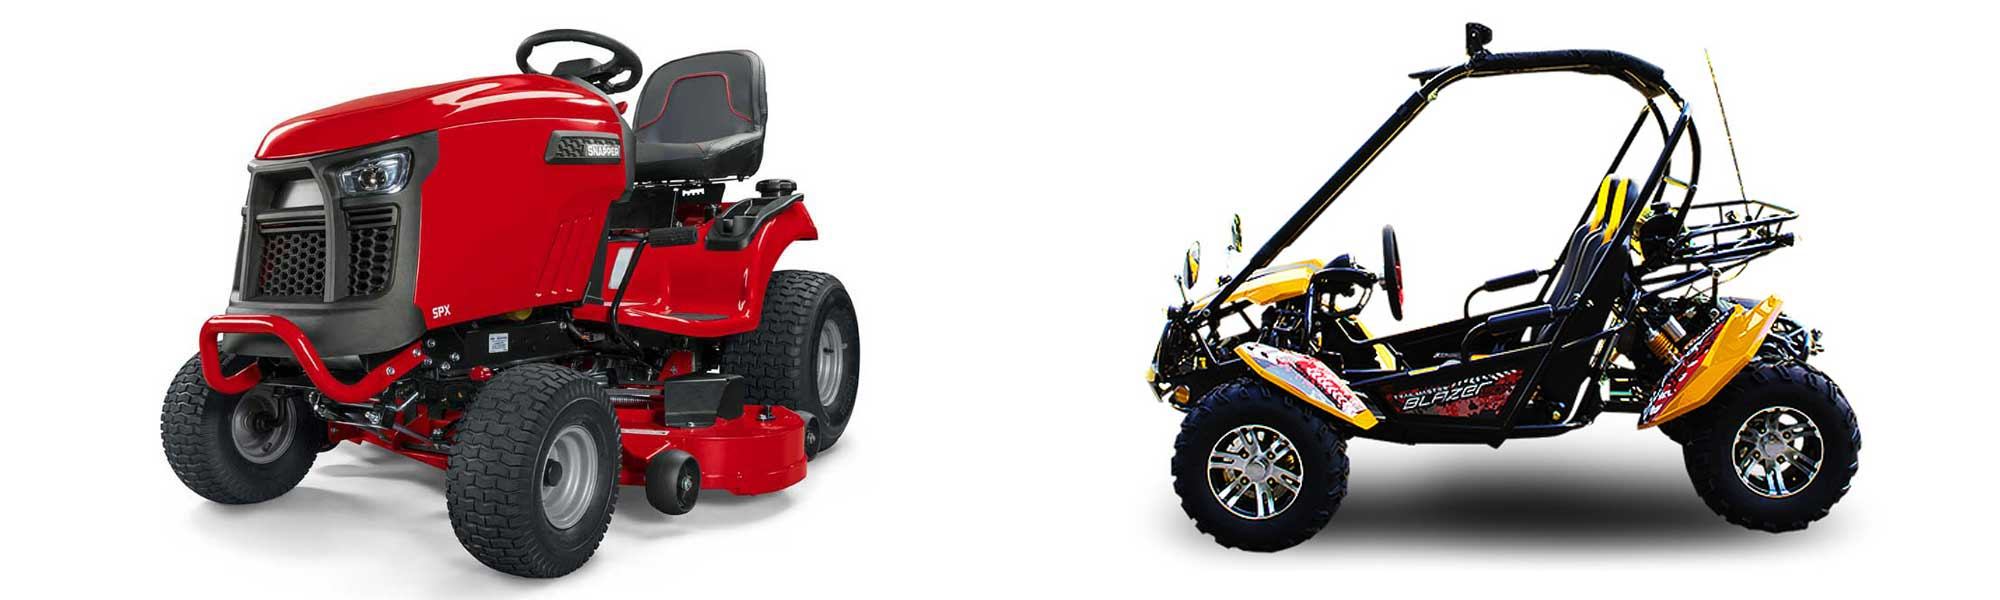 Mower & ATV